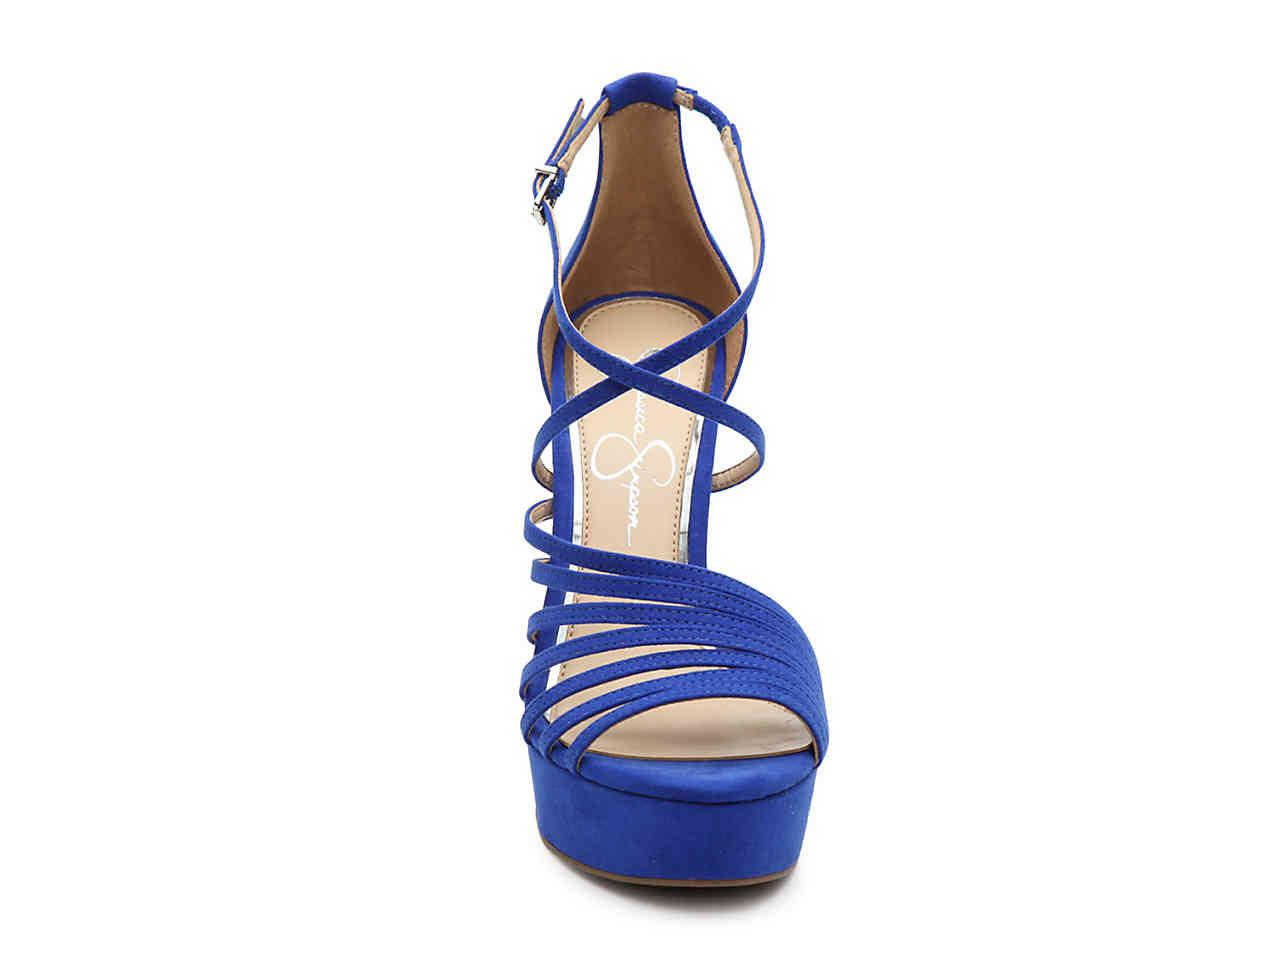 4f375dc162 Jessica Simpson Bravani Platform Sandal in Blue - Lyst